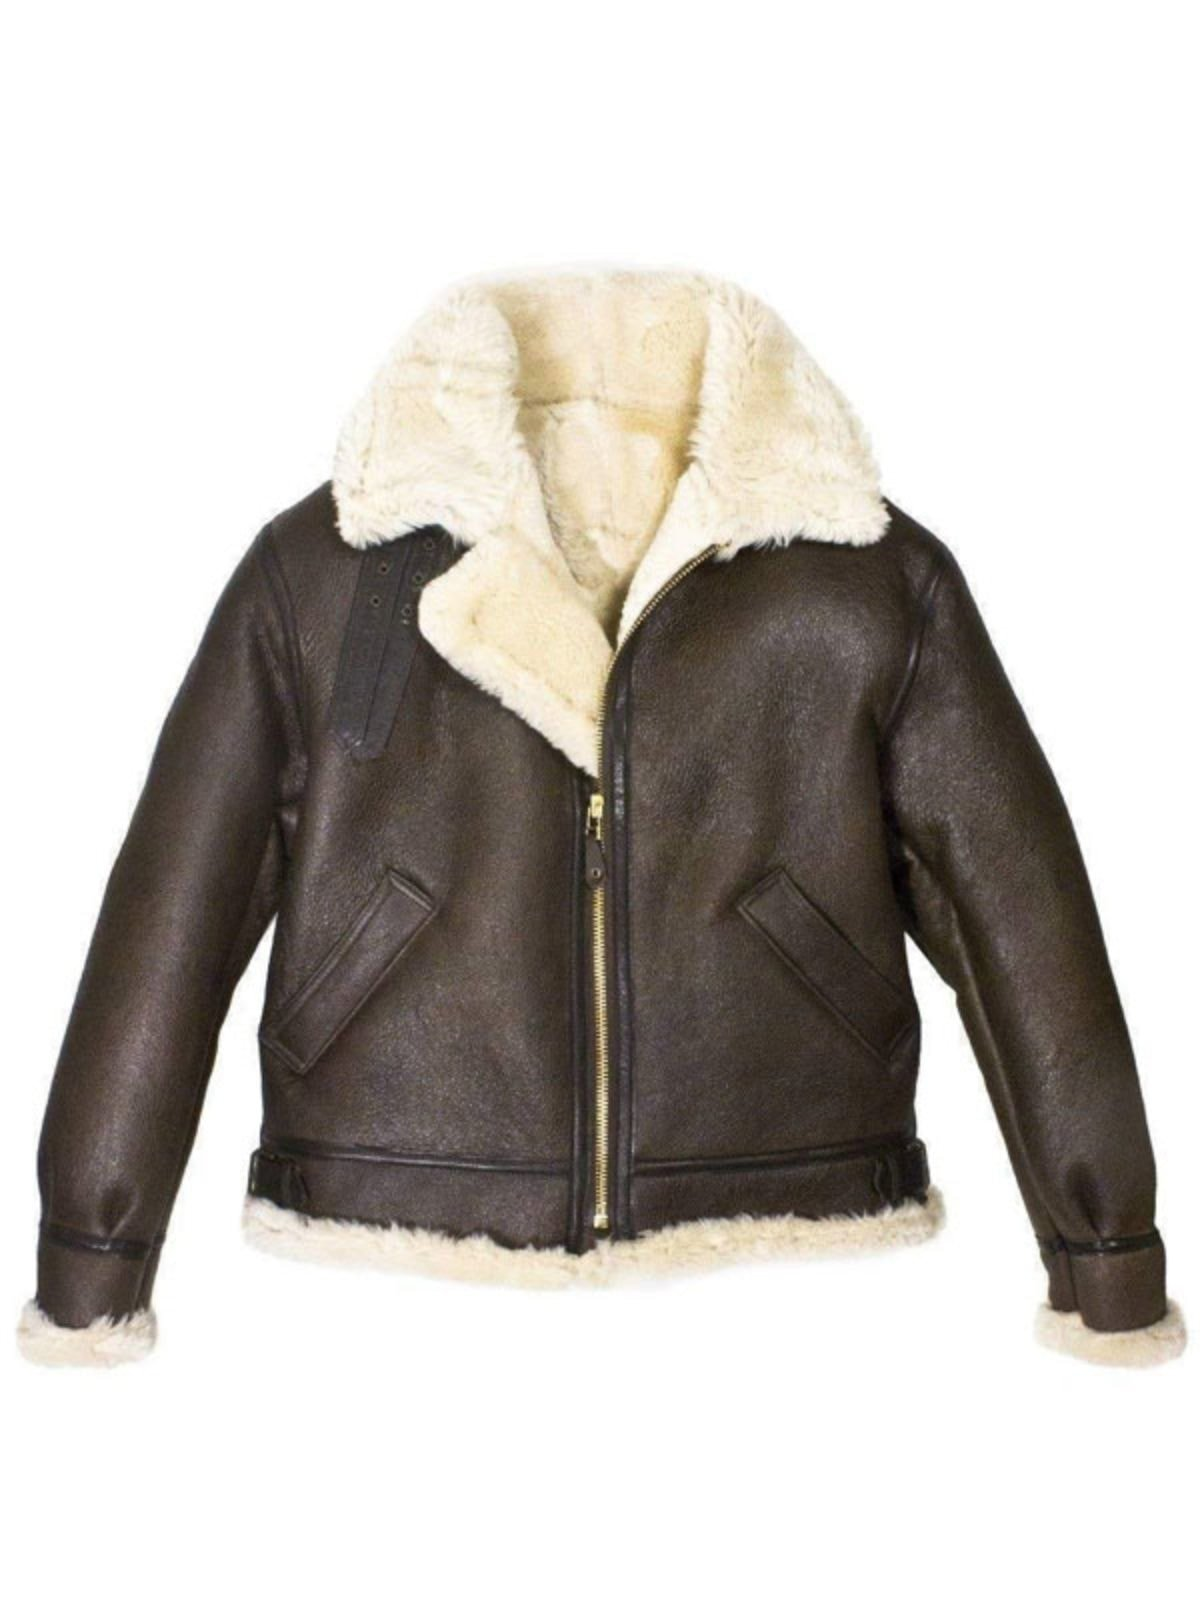 Mens B3 Bomber Aviator WWII Shearling Sheepskin Leather Jacket